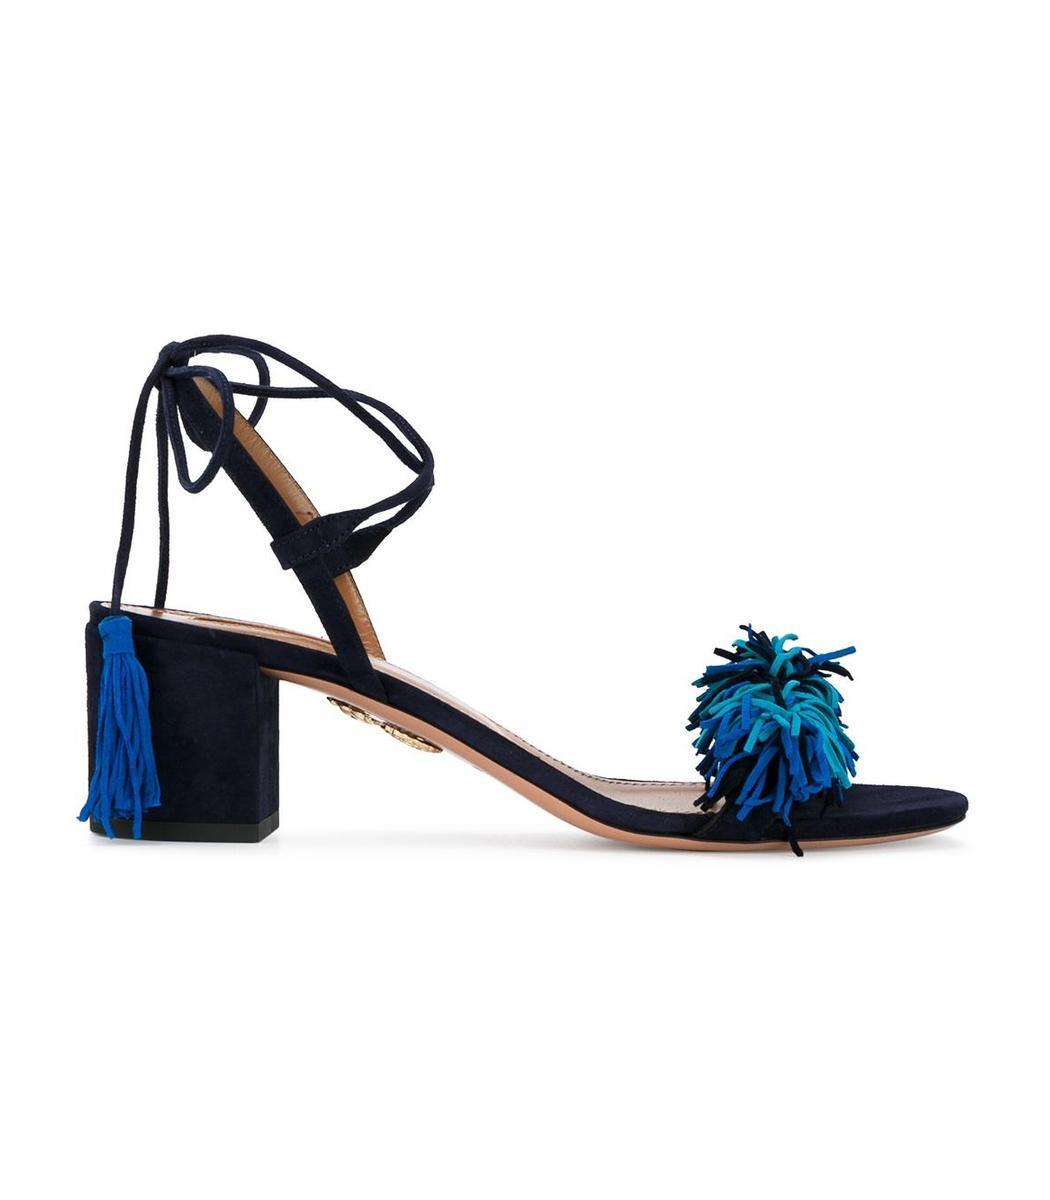 Aquazzura Suedes Black & Blue 'Wild Thing' Sandal